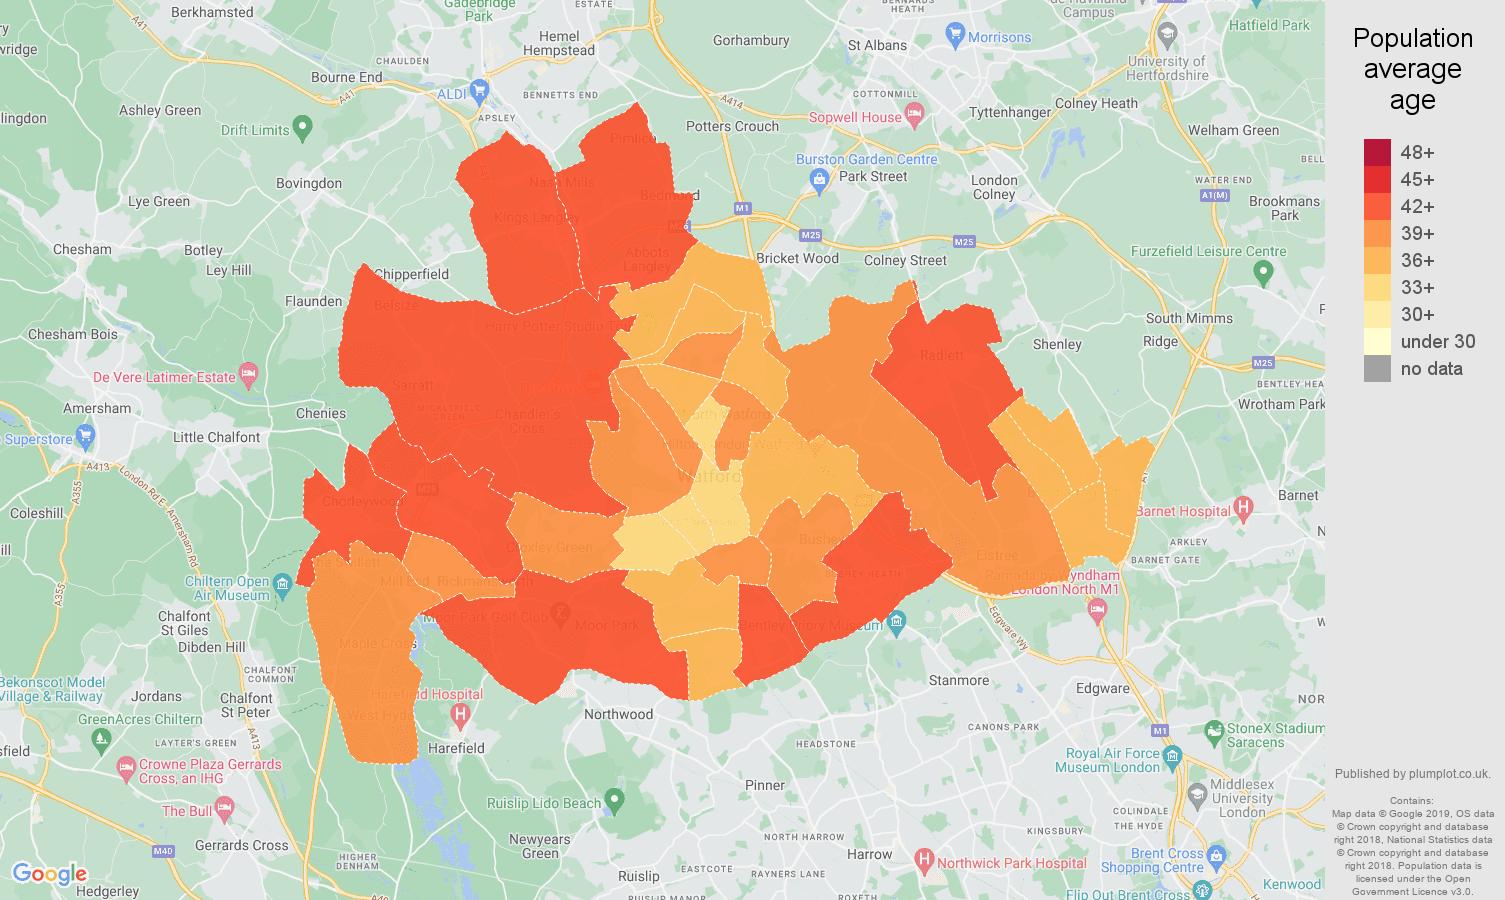 Watford population average age map